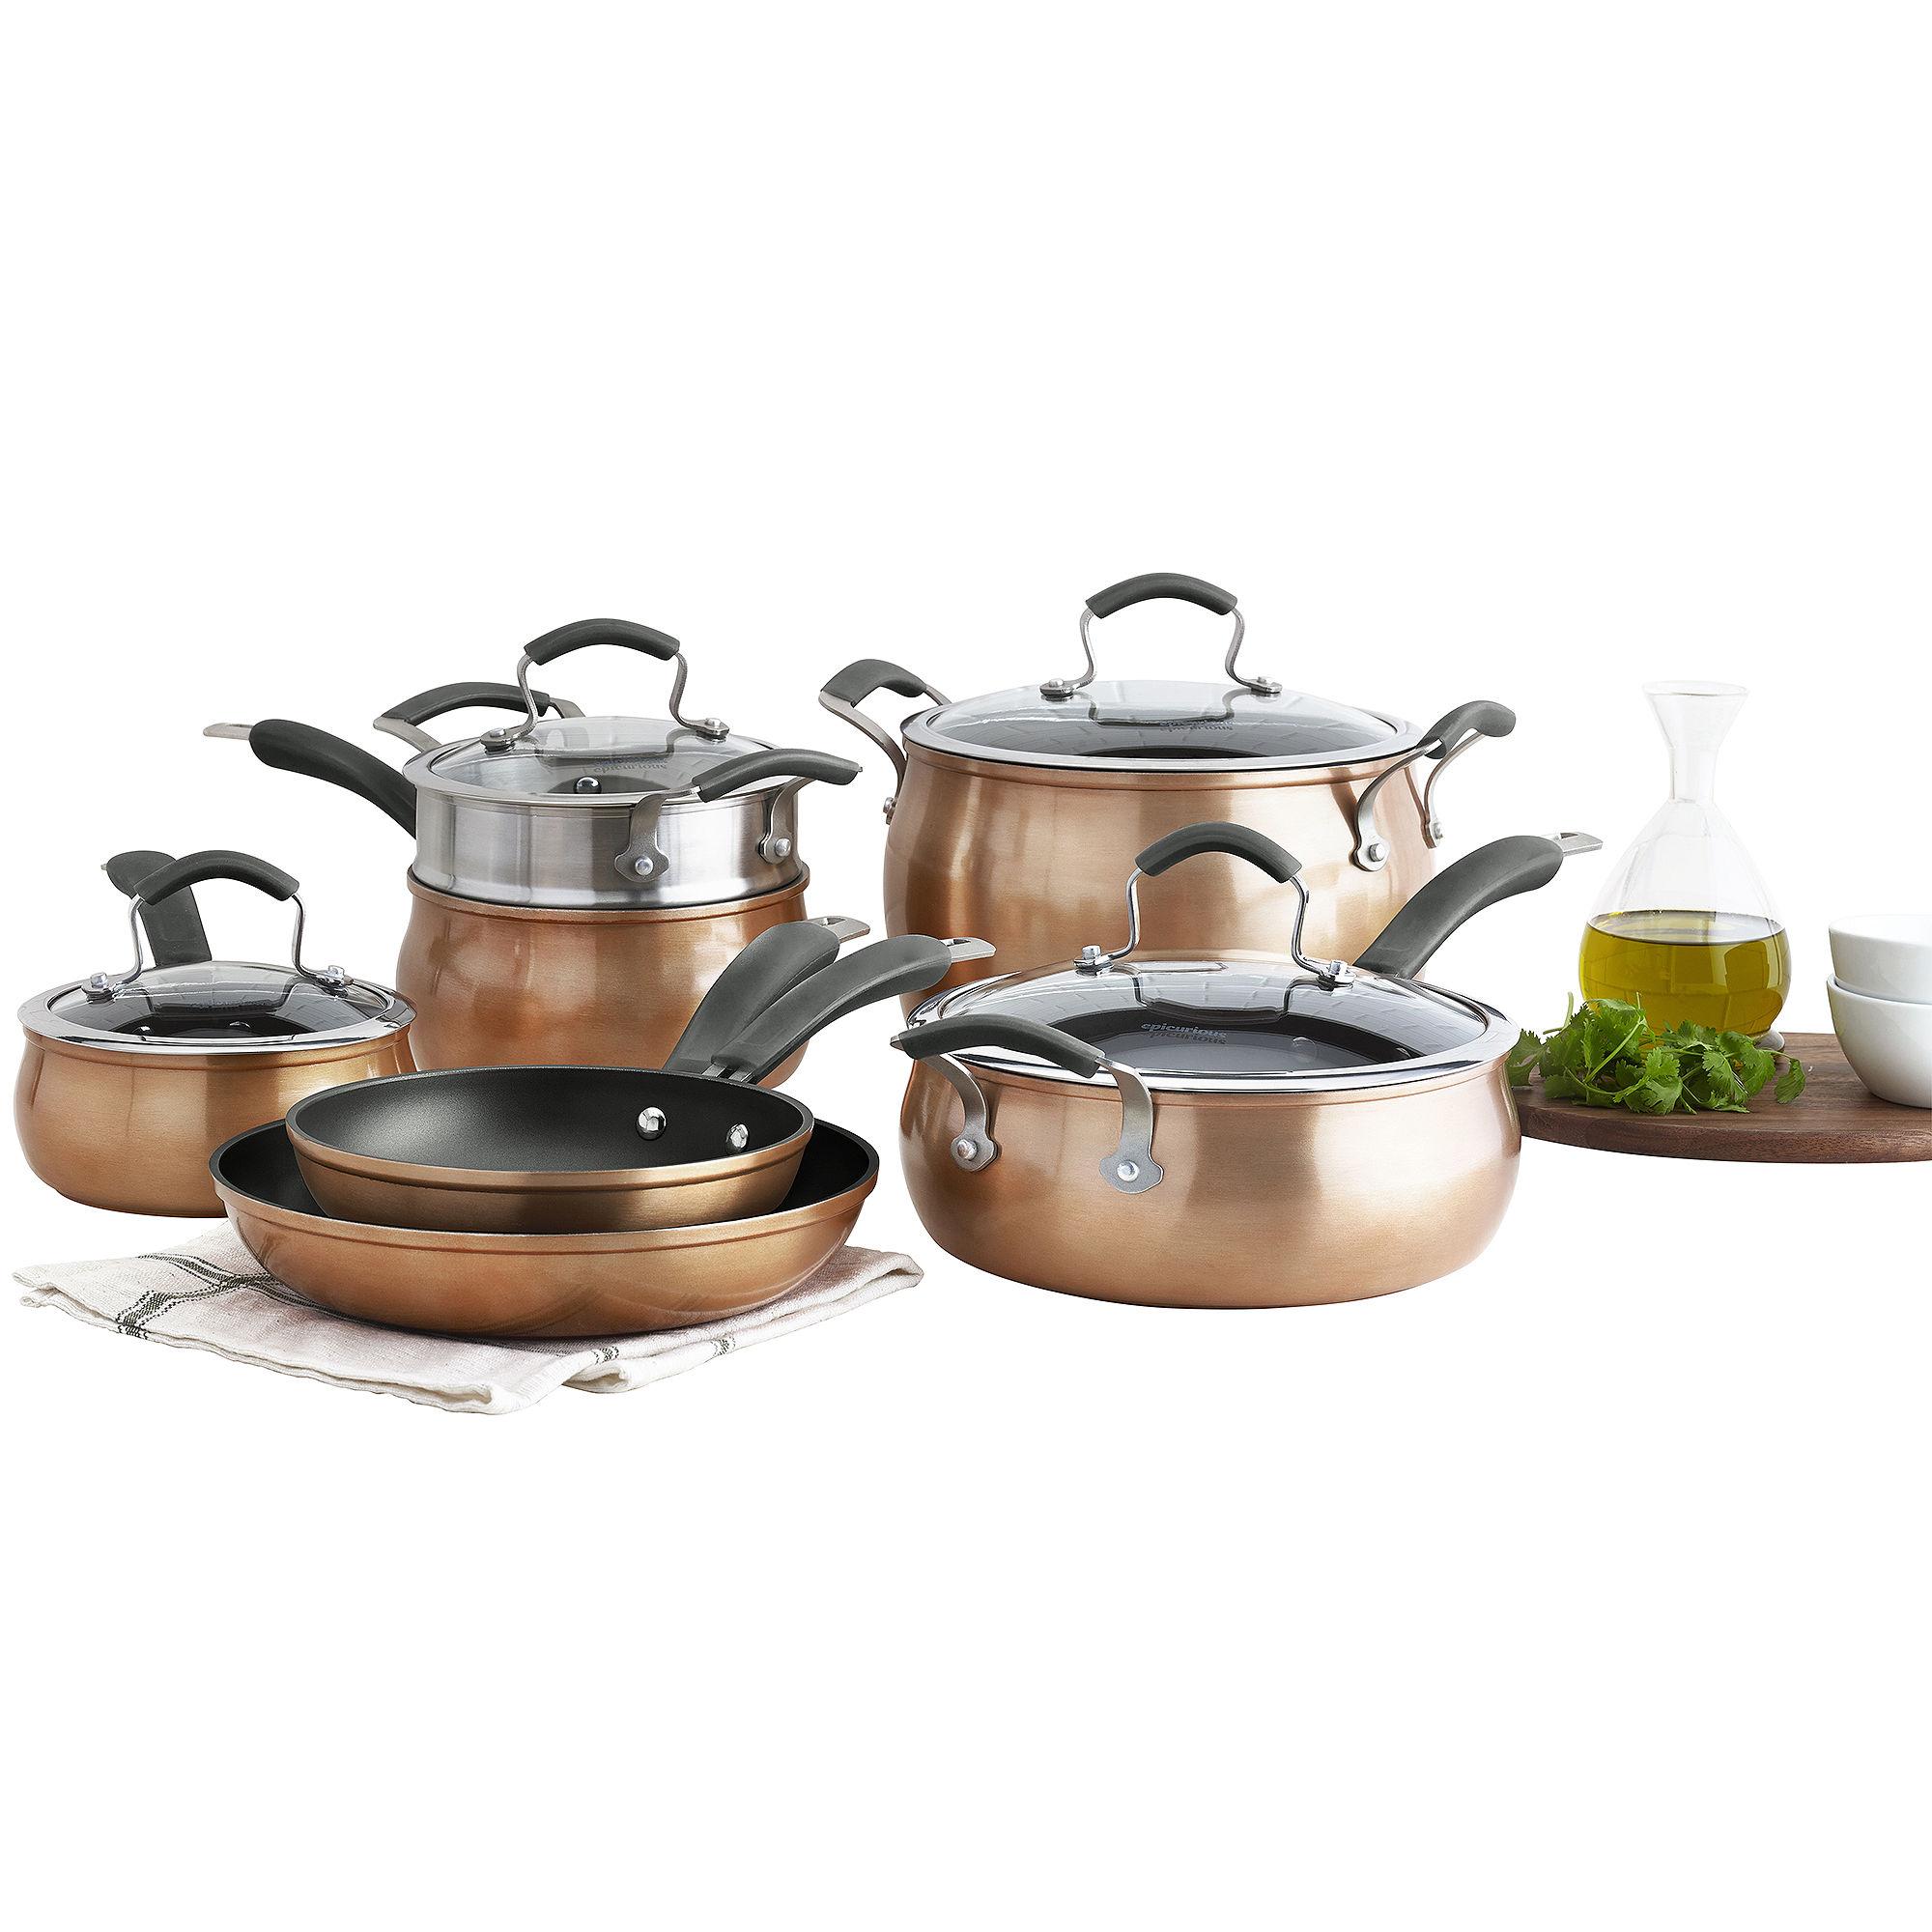 Buy cajun cookware griddles 14 inch round reversible for Kitchen set aluminium sederhana